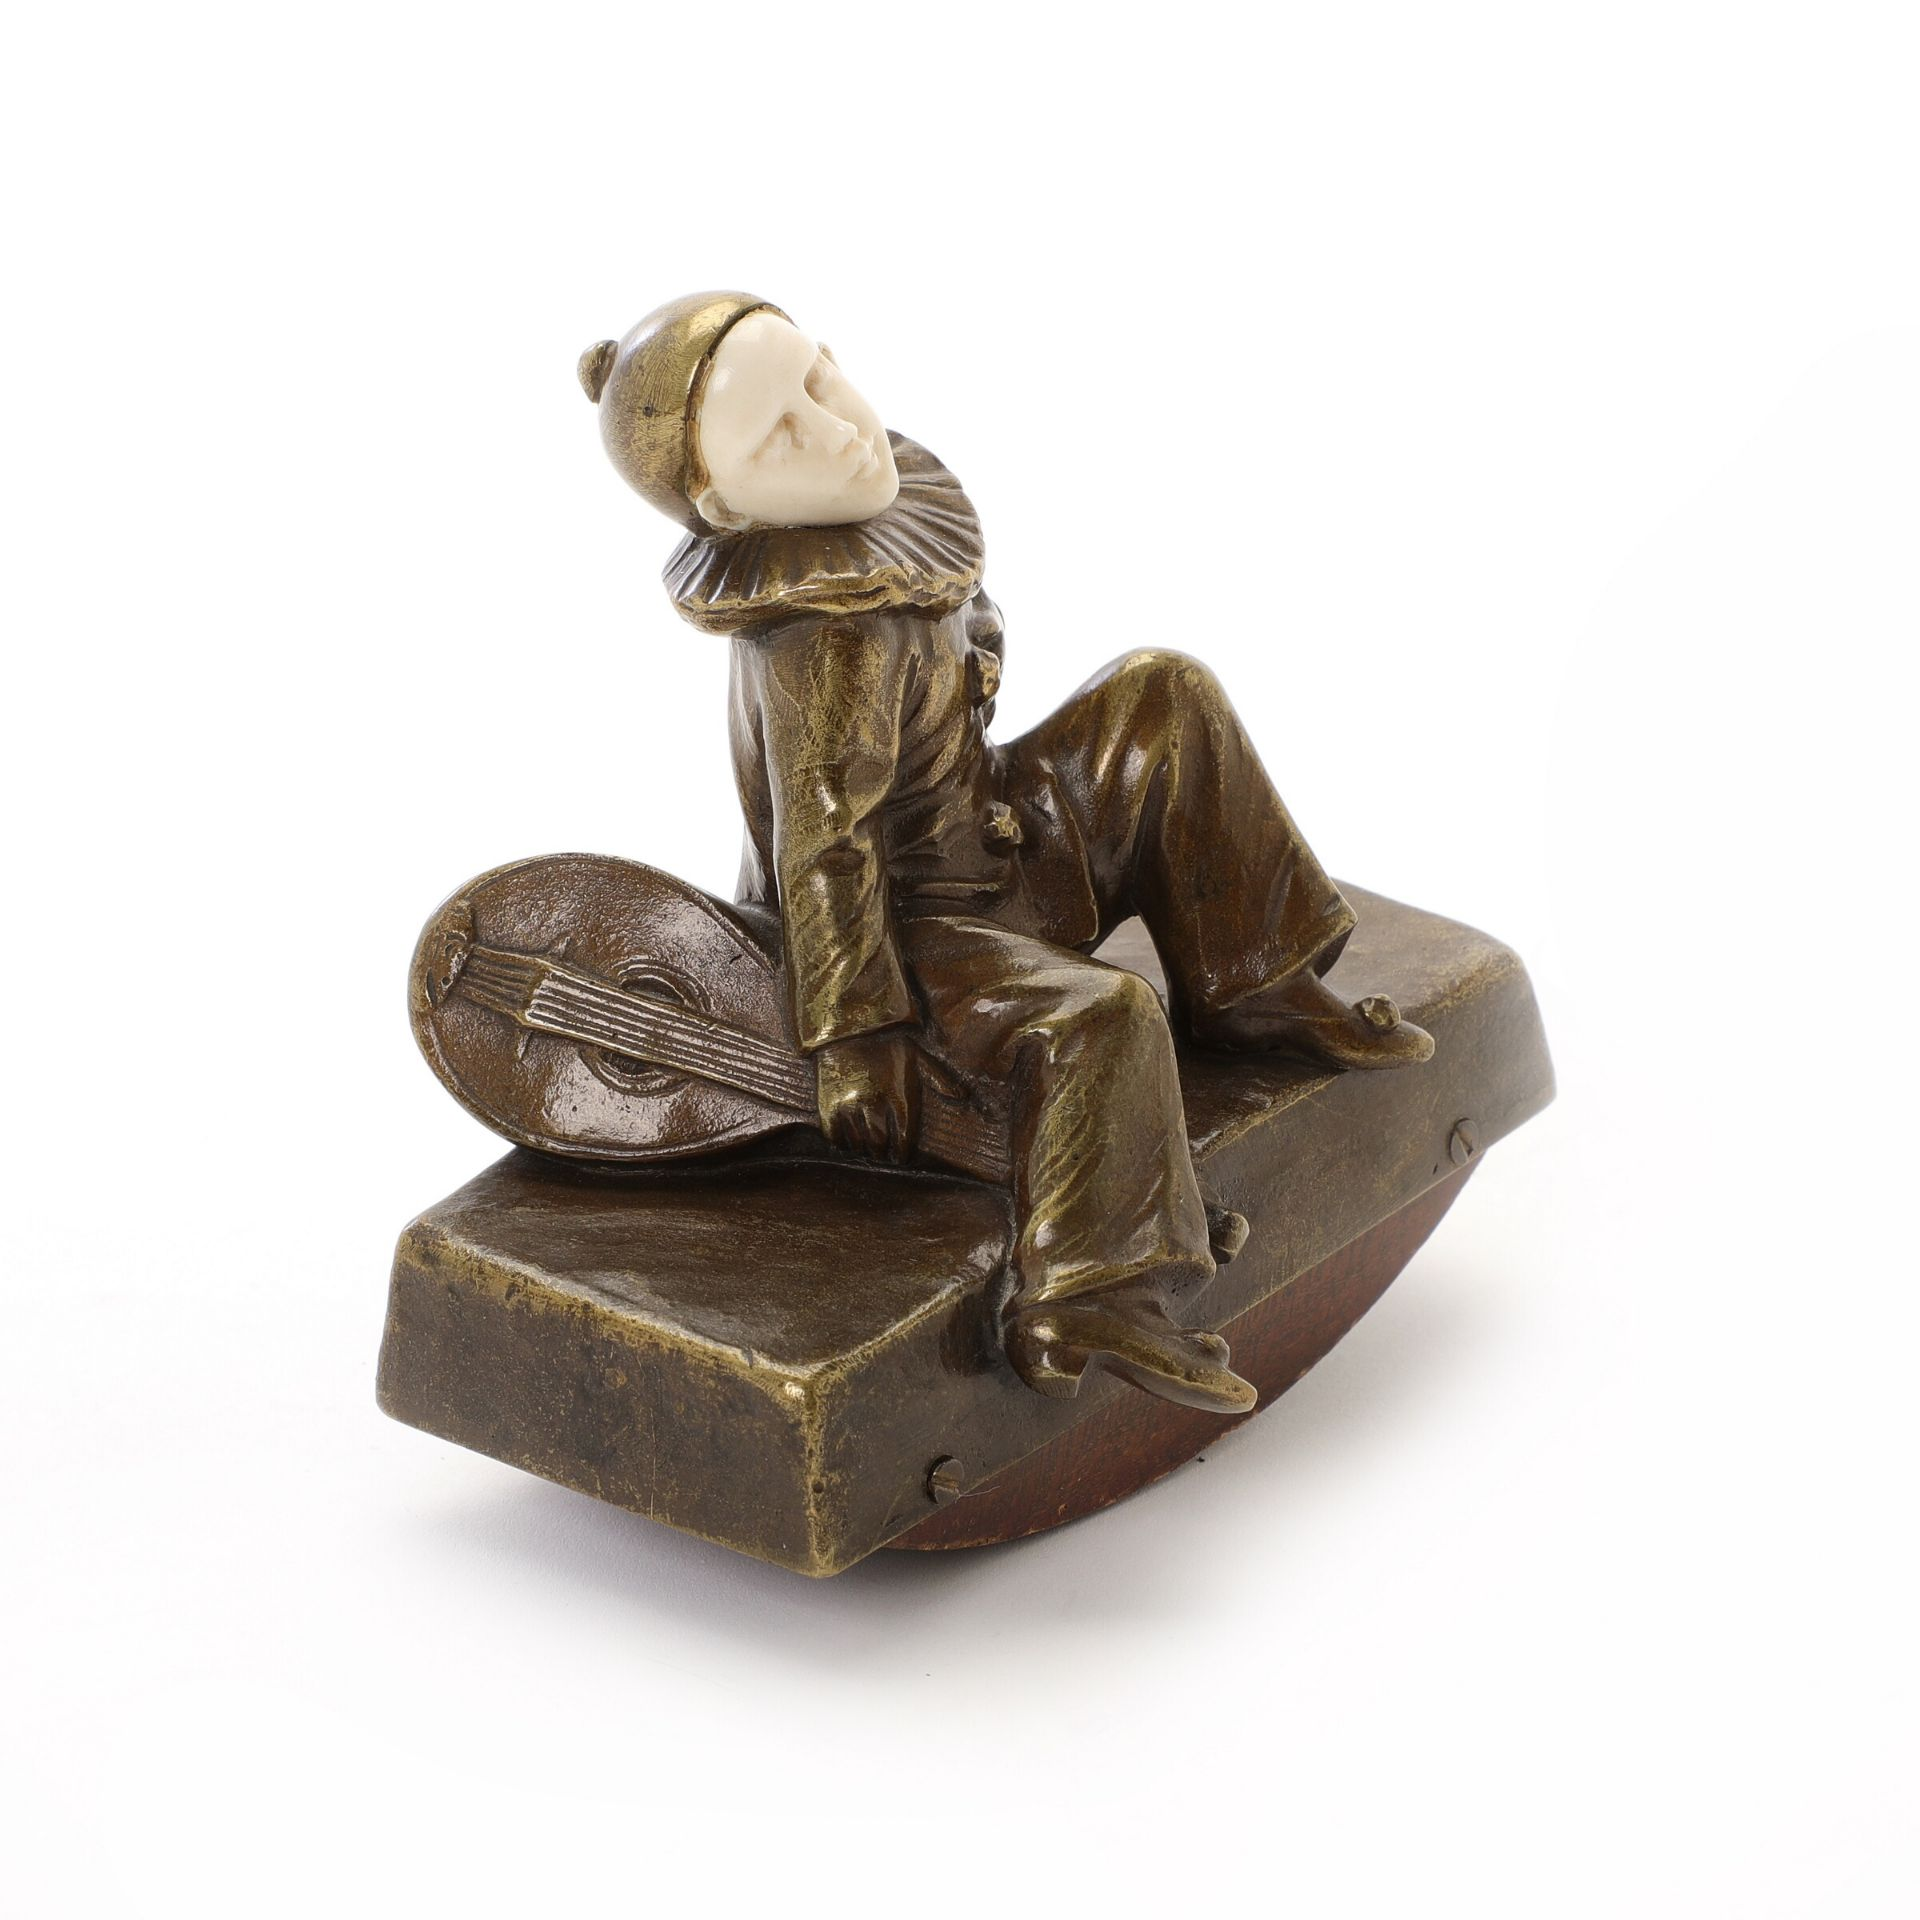 Peter Tereszczuk: Pierrot. Signiert P. Tereszczuk. Bronze und Elfenbein. H. 10.5 cm B. 10.5 cm.